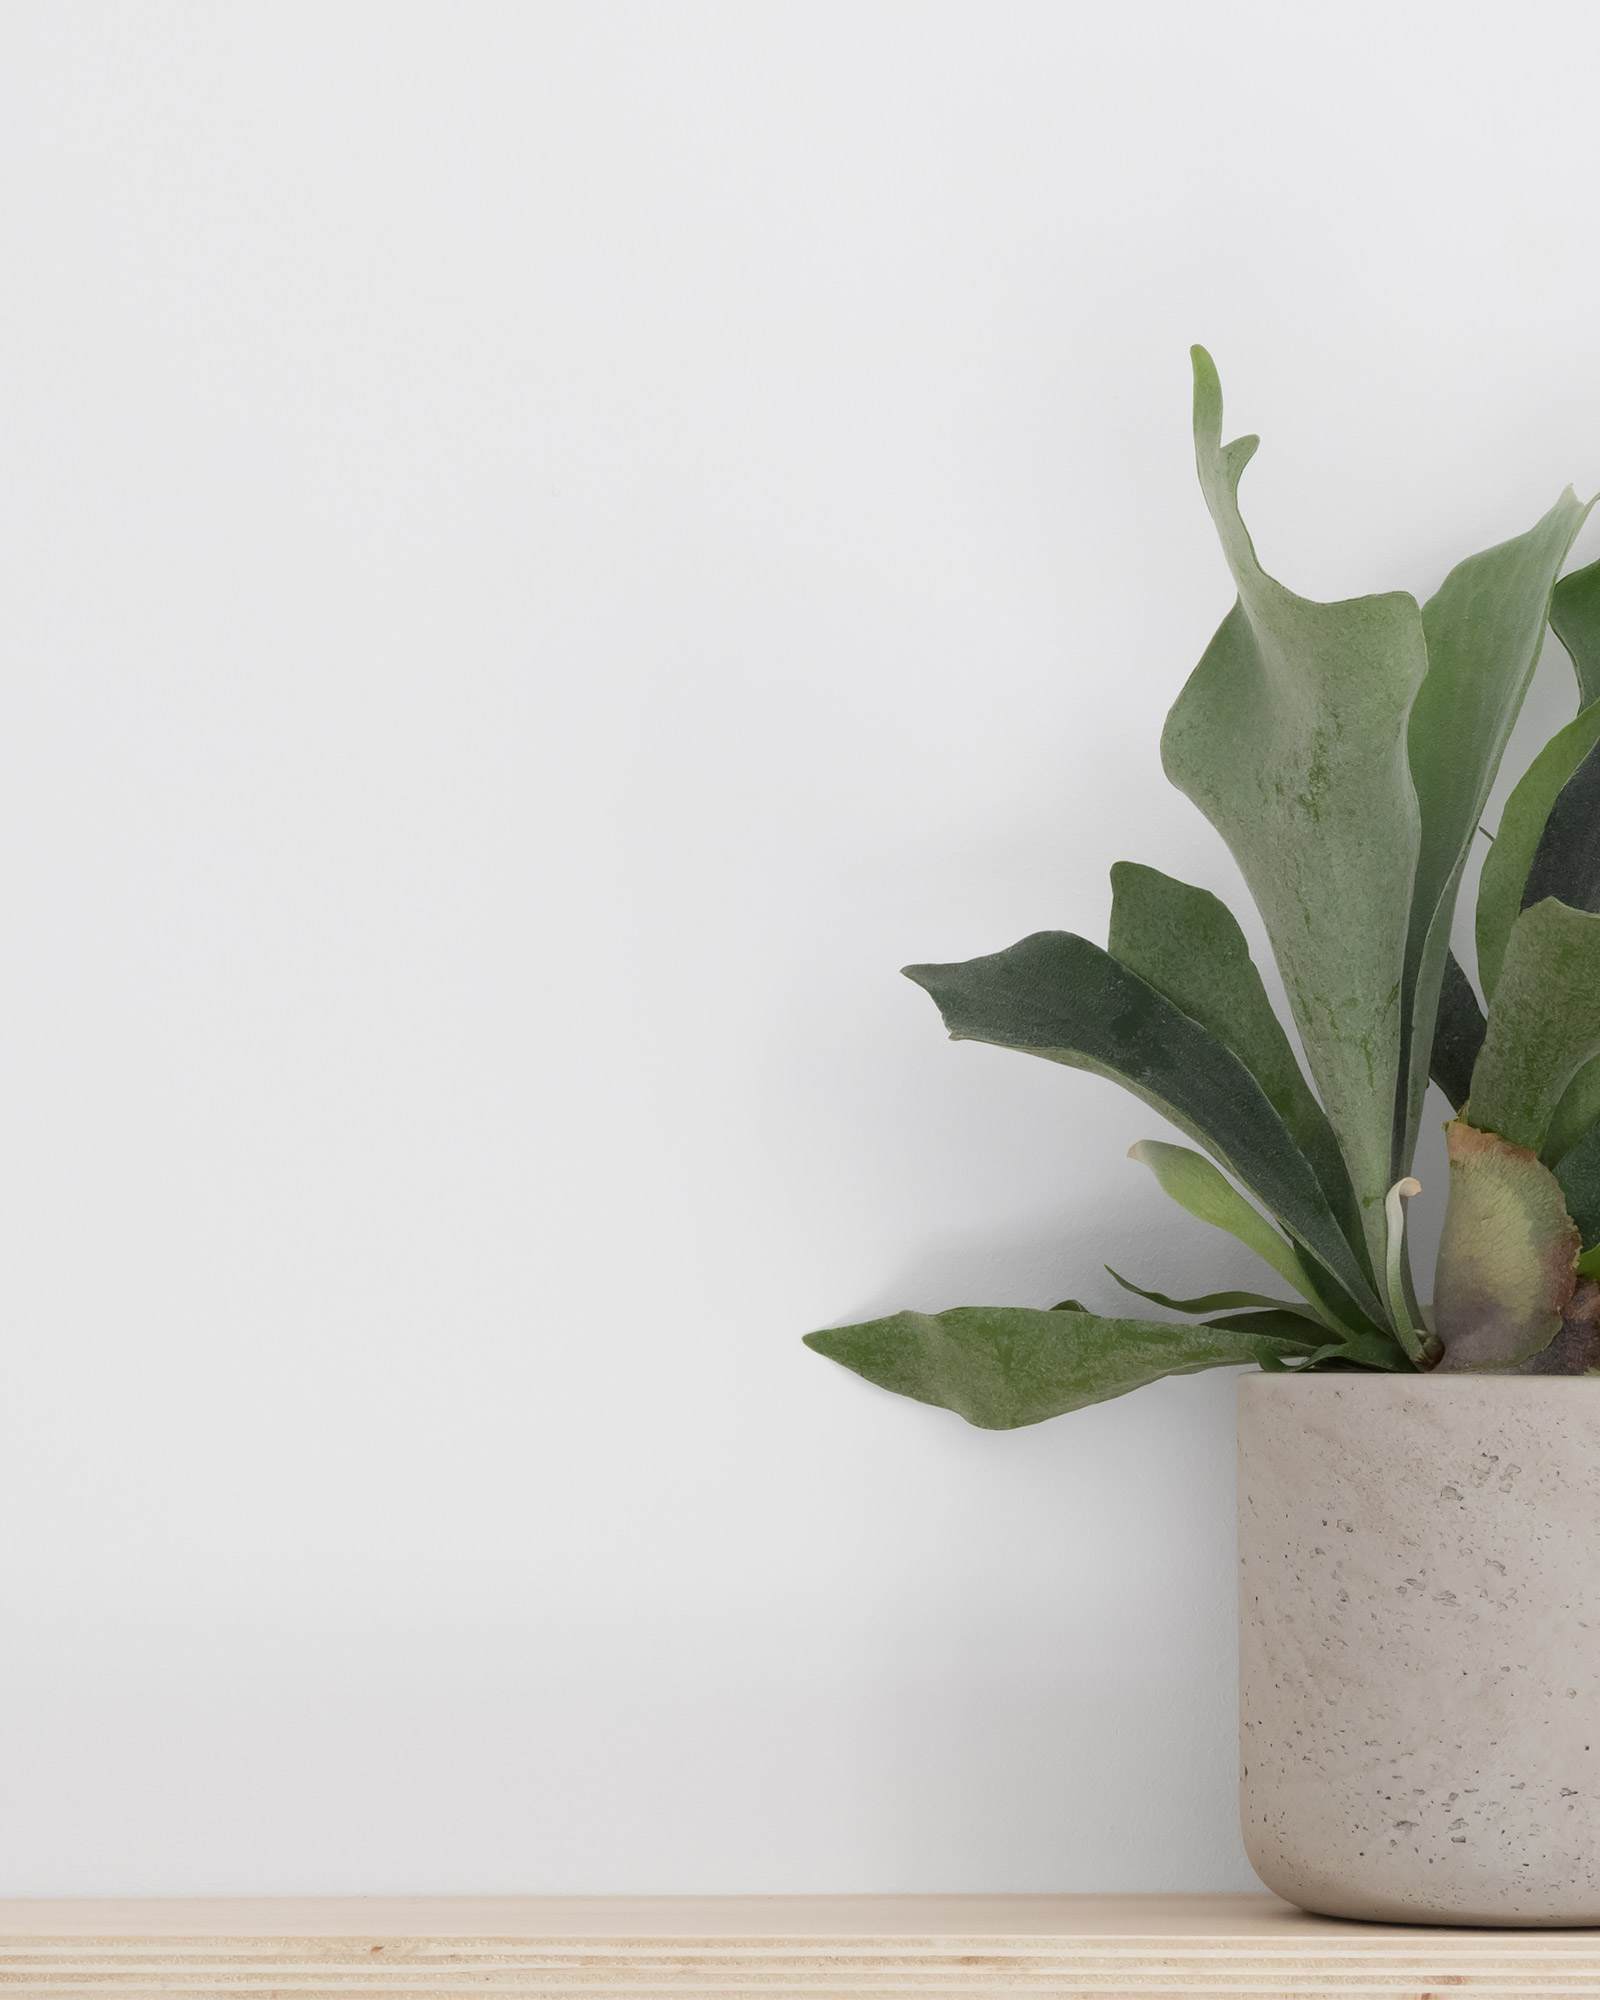 Staghorn fern in concrete planter on plywood shelf